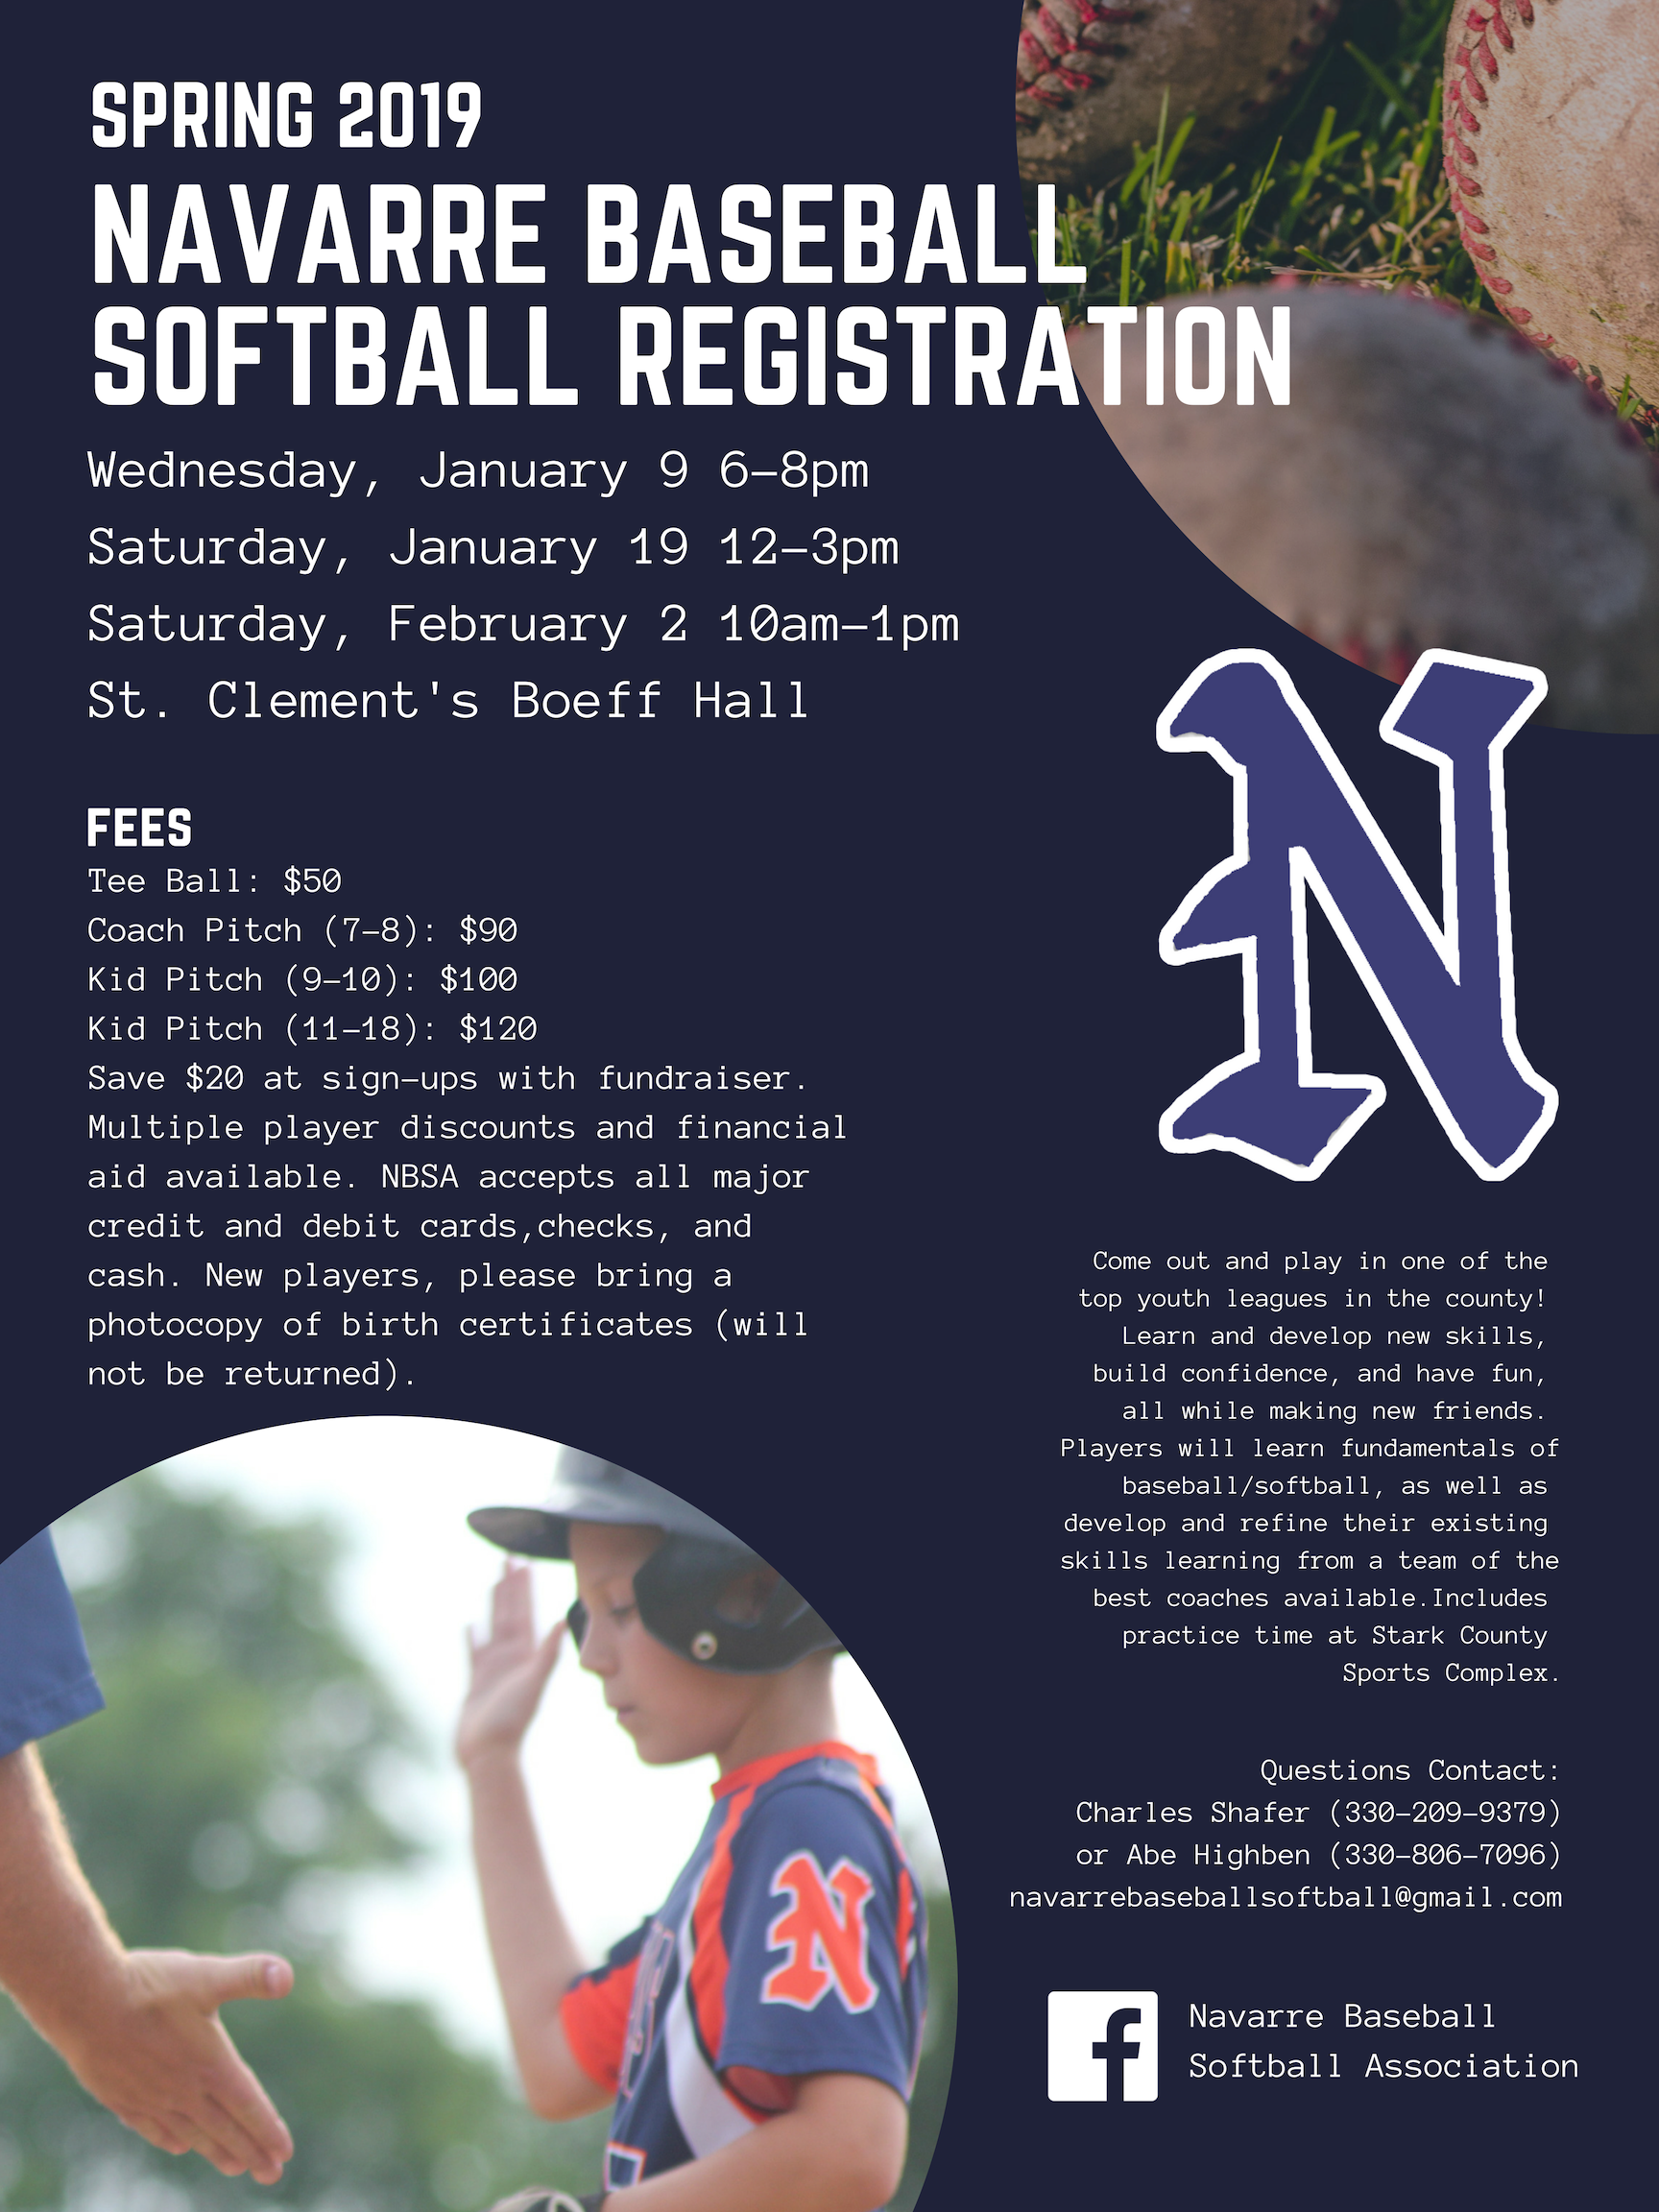 Navarre Baseball Softball Association